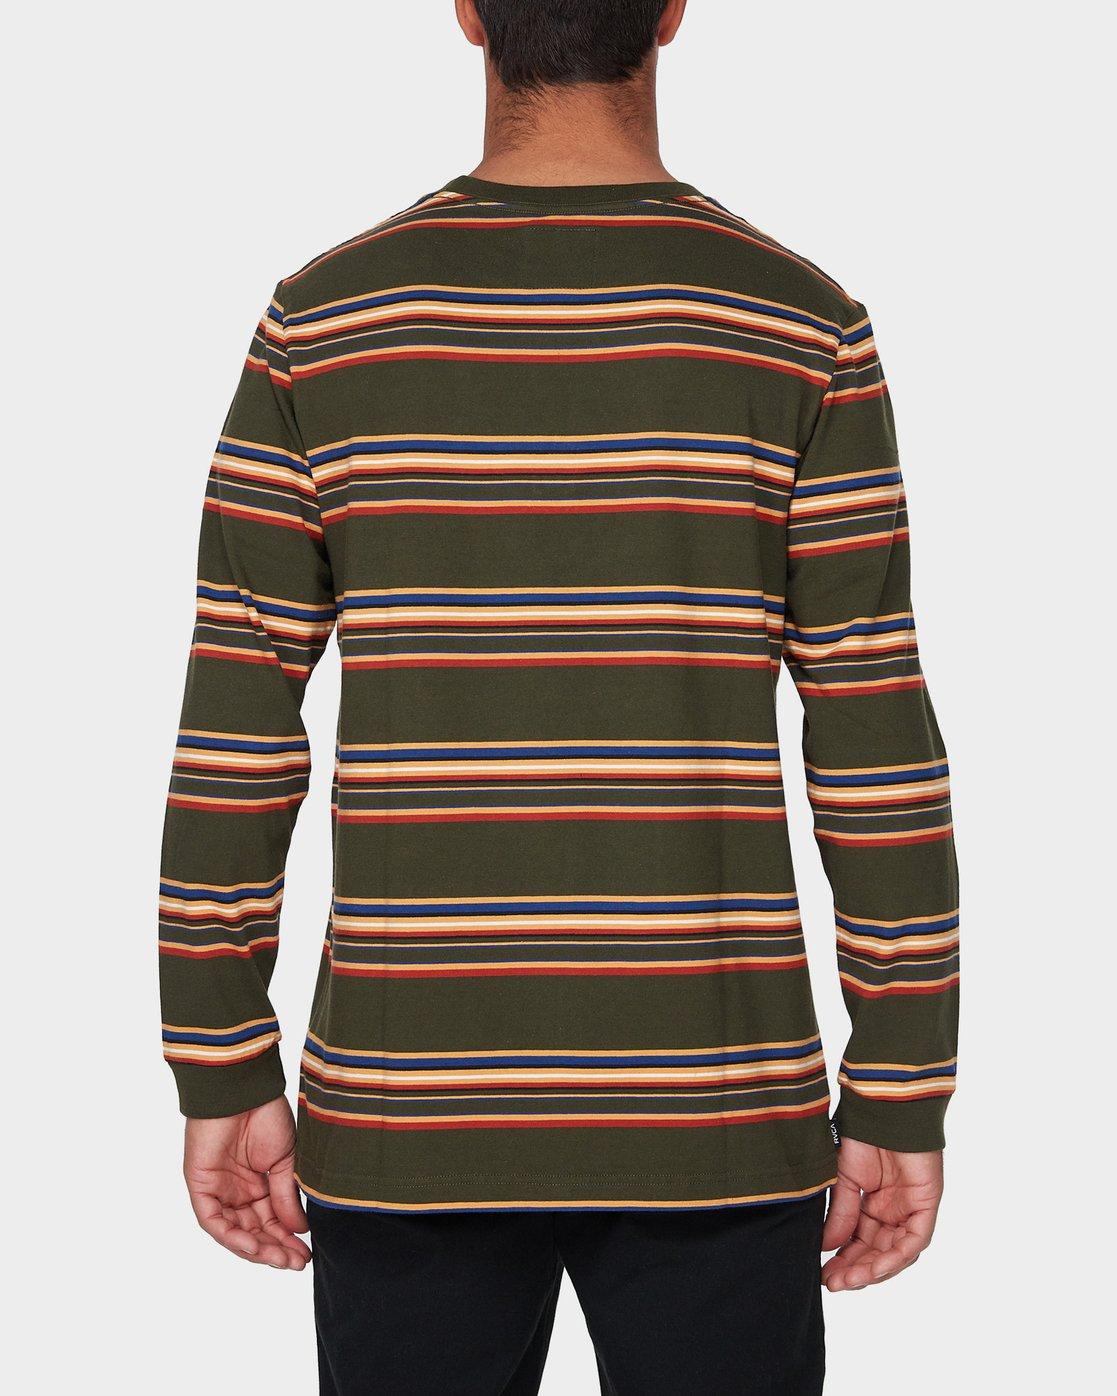 2 RVCA Crest Long Sleeve T-Shirt Green R193097 RVCA